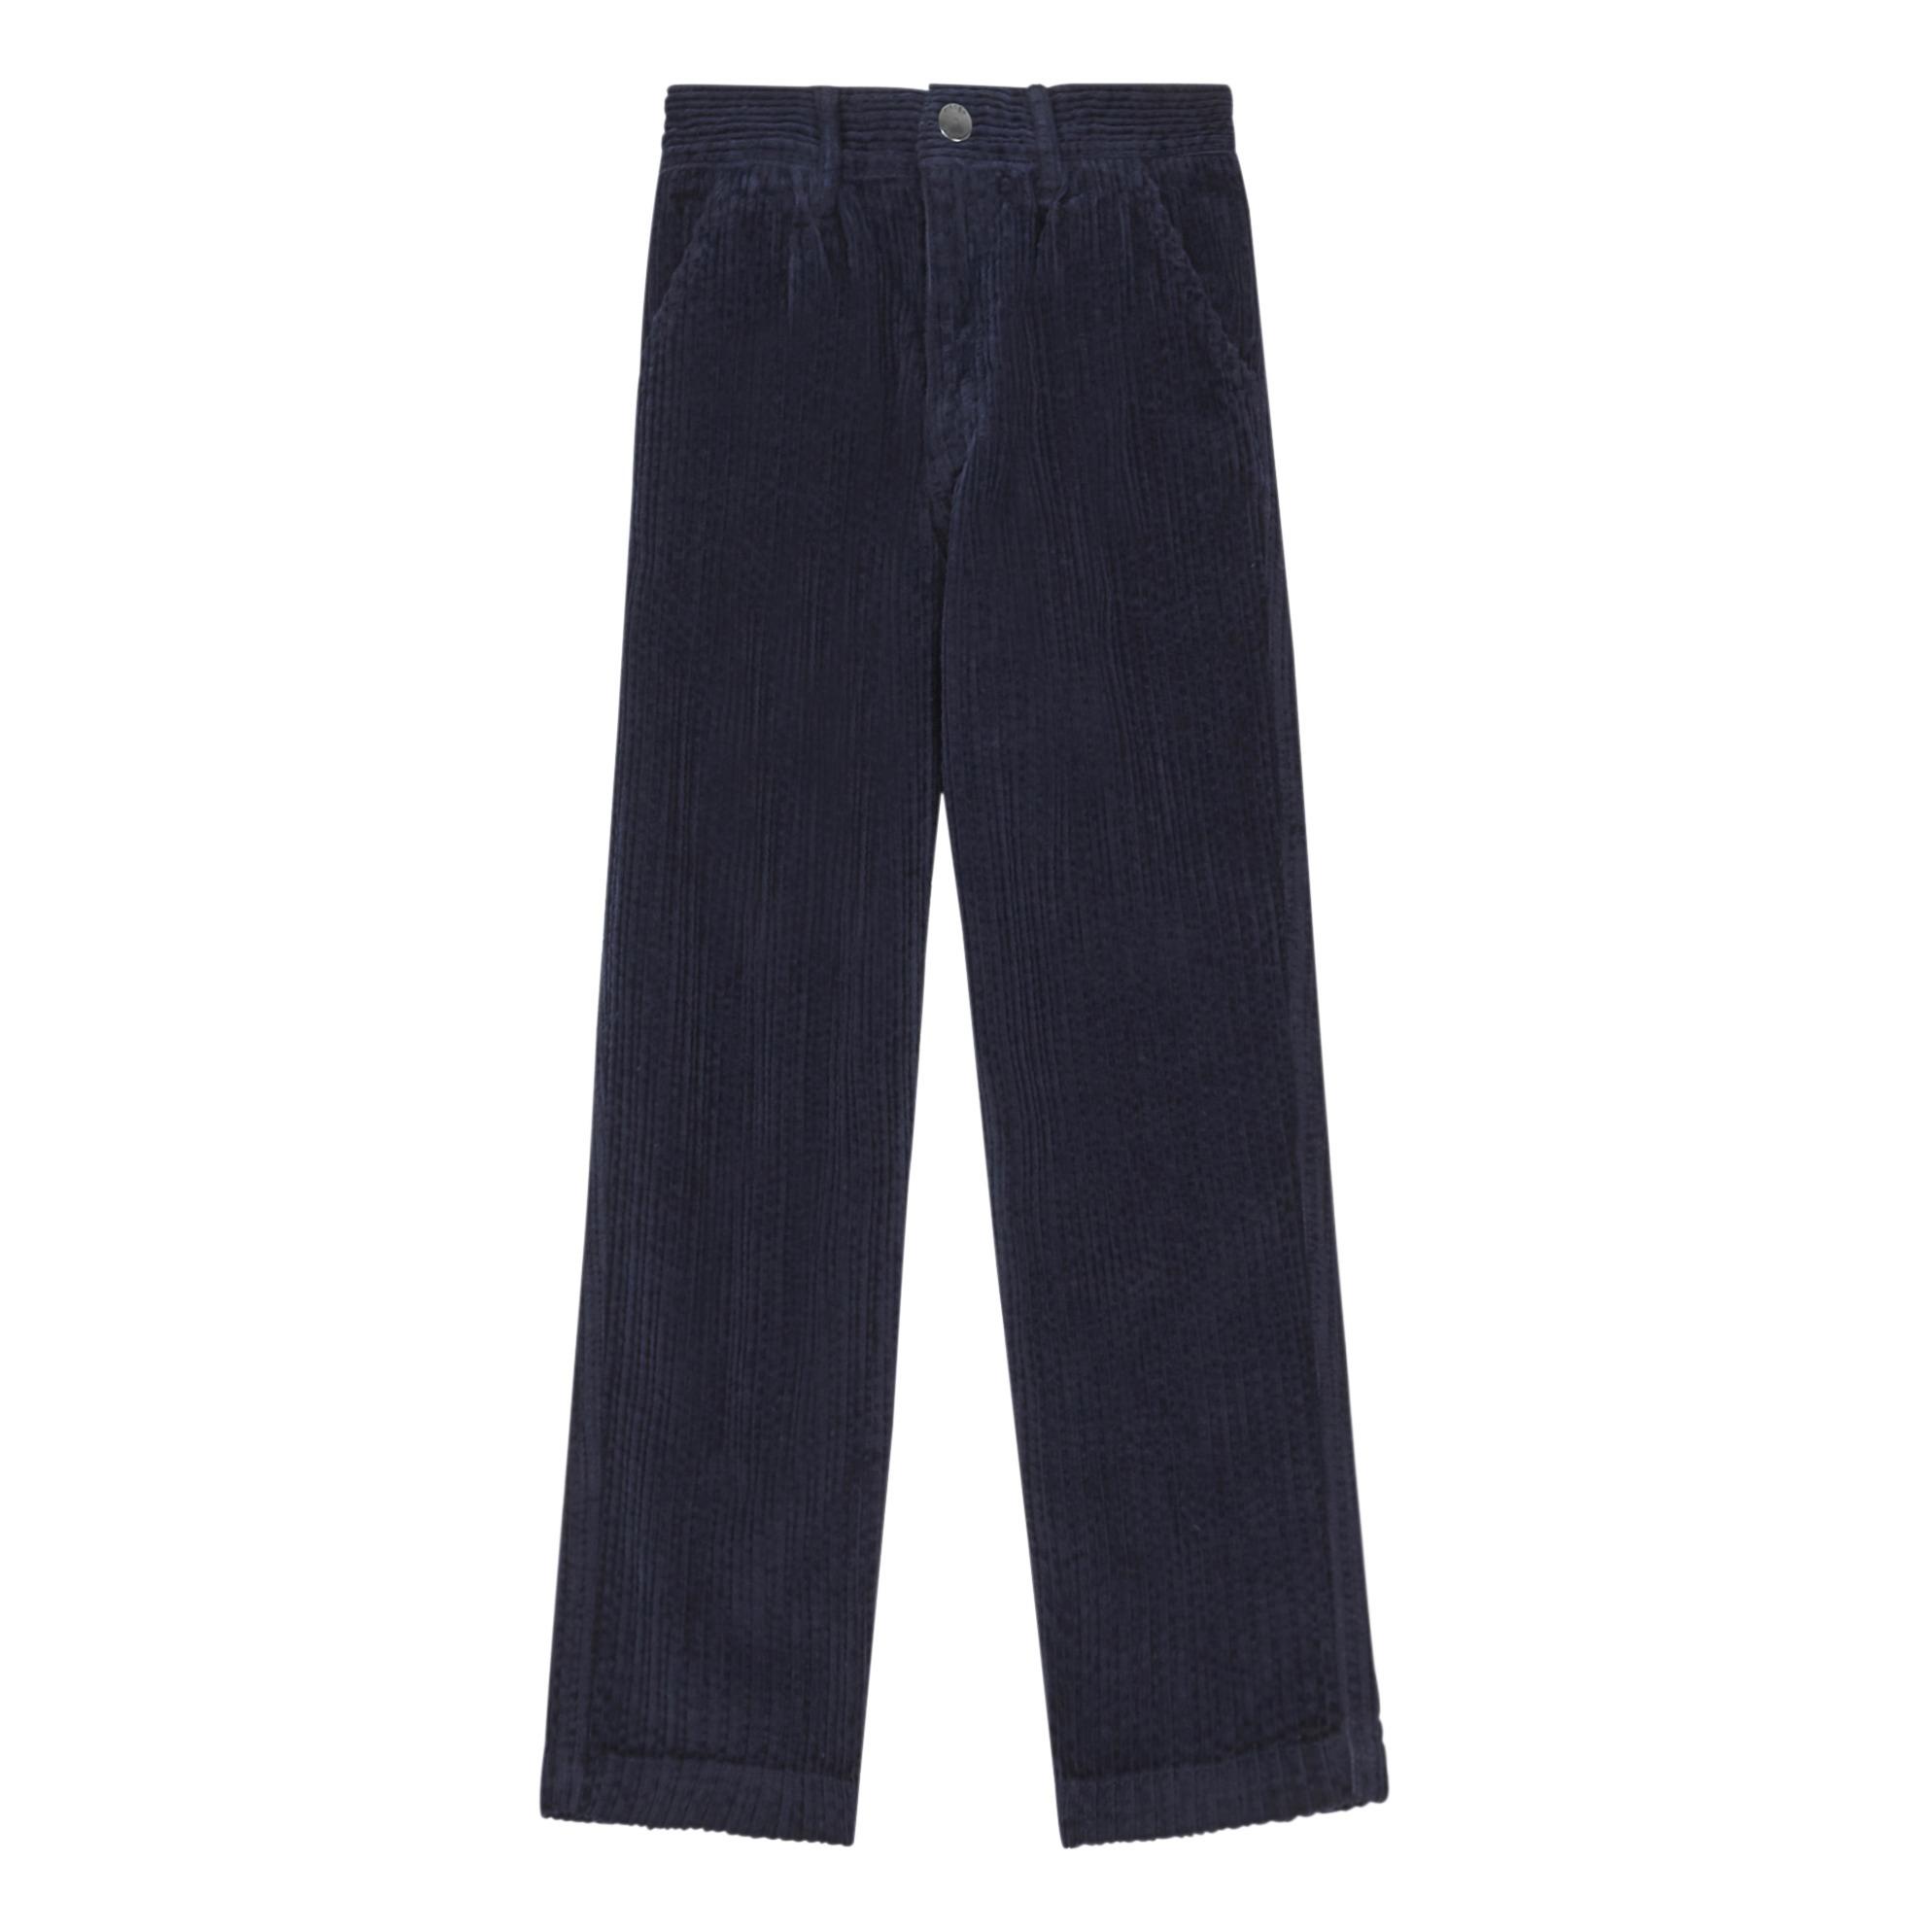 Pantalon Chino Velours